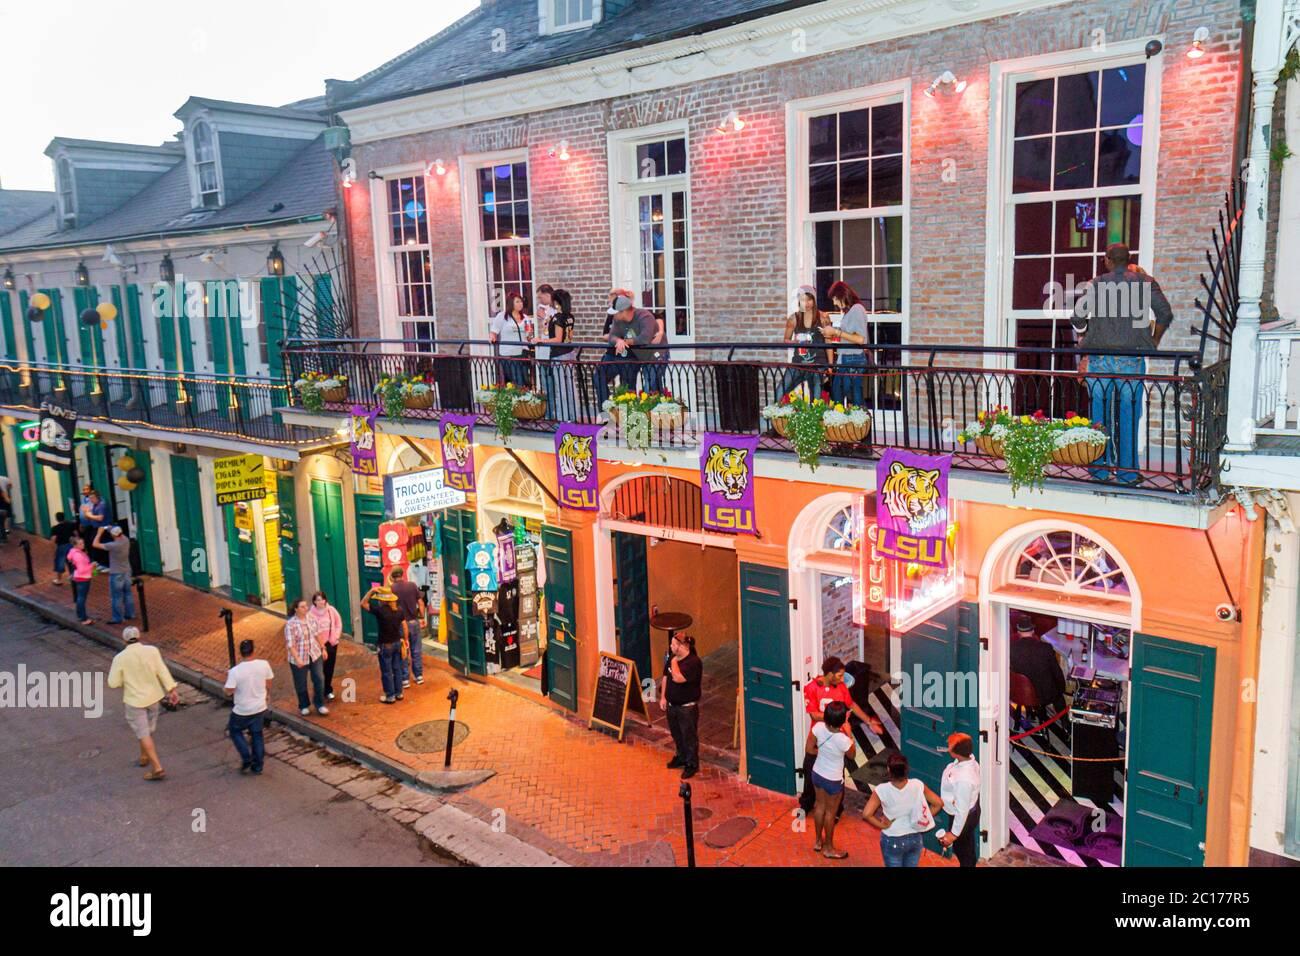 Louisiana, LA, South, Orleans Parish, New Orleans, French Quarter, Bourbon Street, Bourbon Heat Club, dance club, drink drinks beverage beverages drin Stock Photo